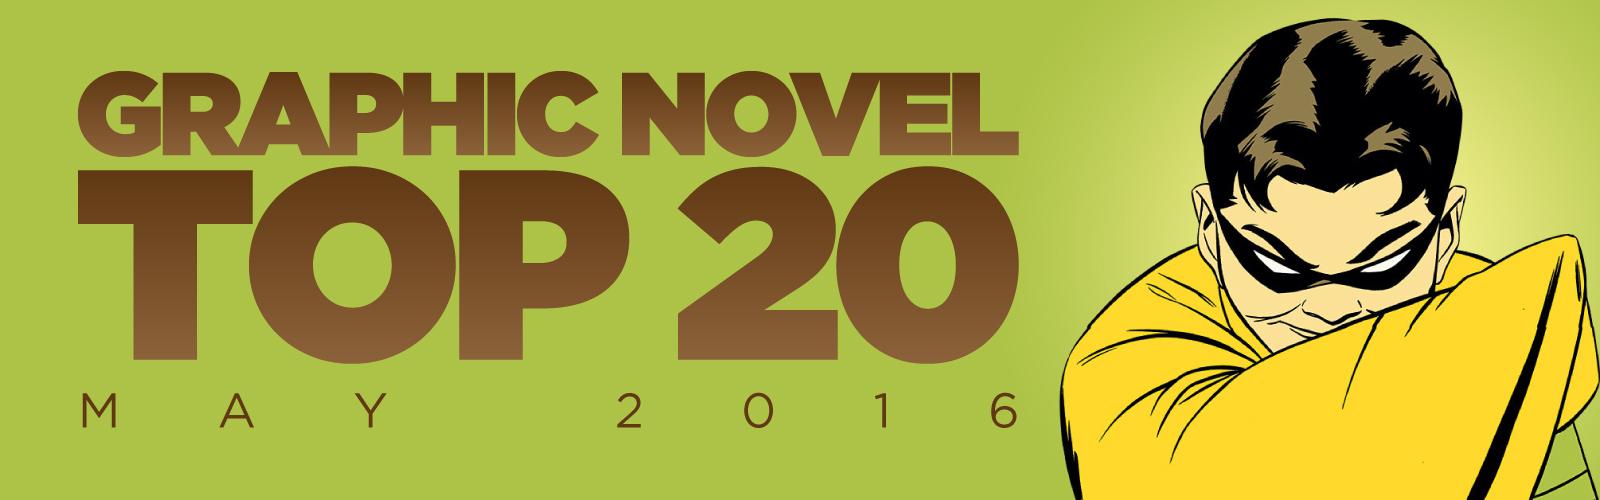 ACE Comics Top 20 Graphic Novels Chart, May 2016